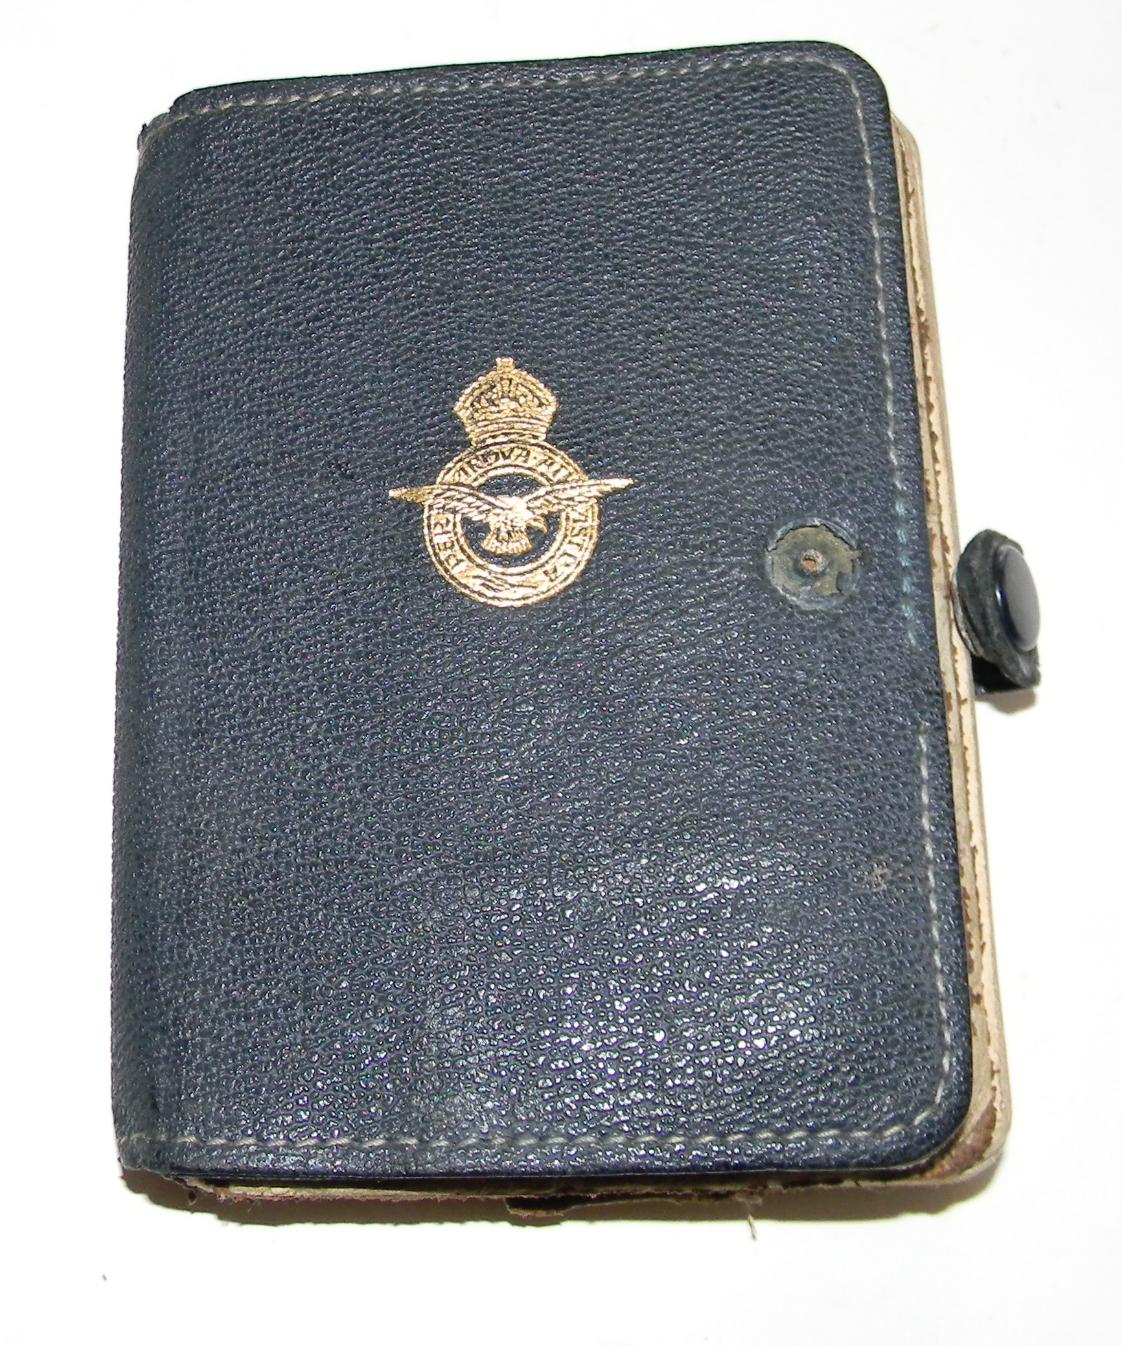 1941 RAF Polish pilot's diary